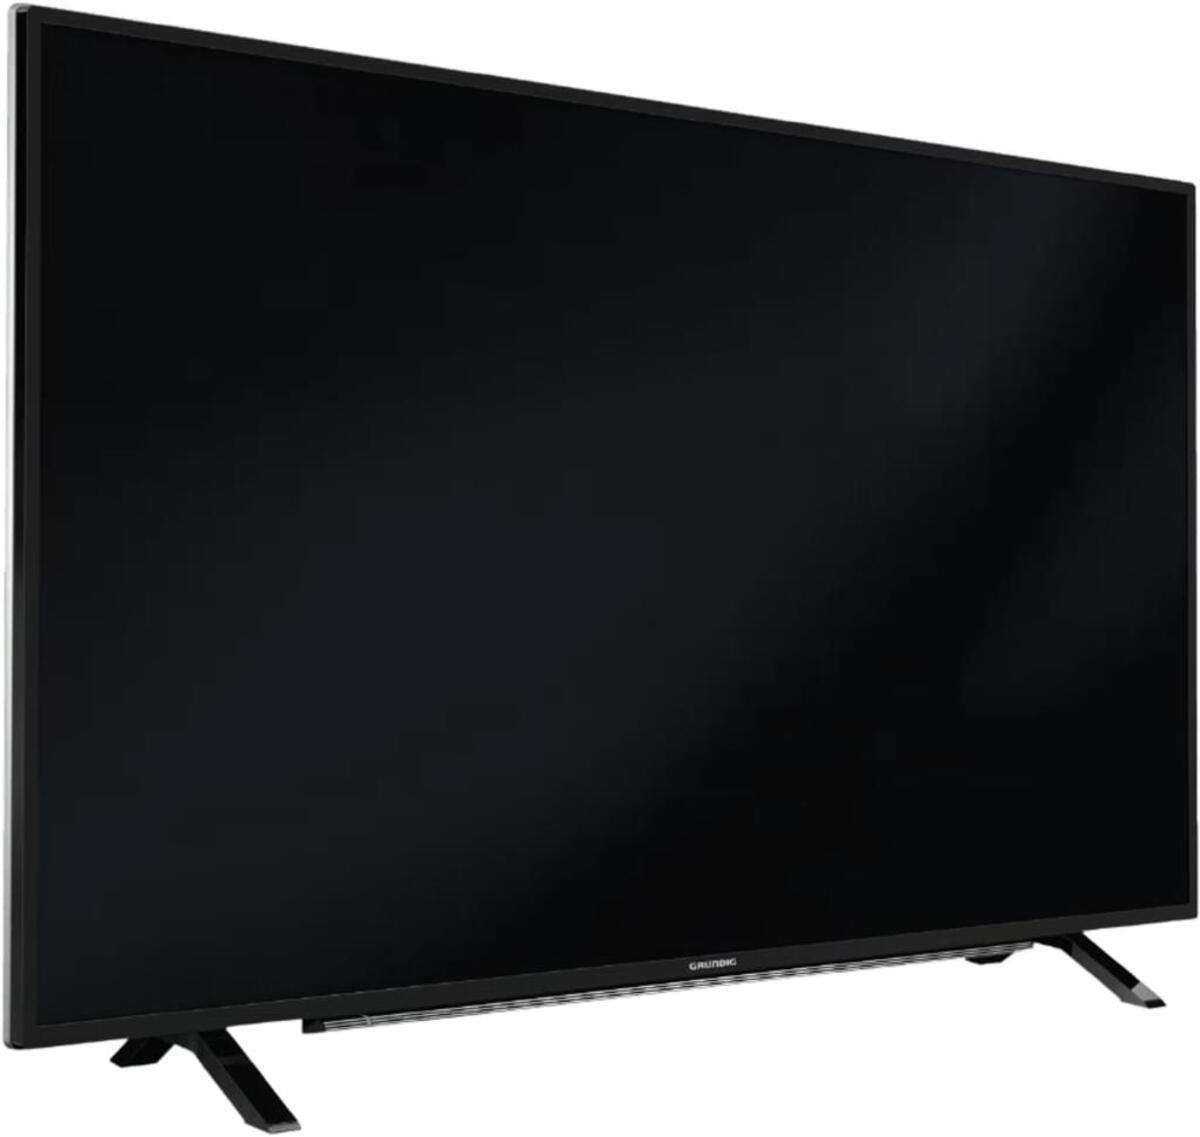 Bild 2 von Grundig 4K Ultra HD LED 139cm (55 Zoll) 55 VLX 6000 UHD Smart TV Fire TV Edition, Triple Tuner, HDR